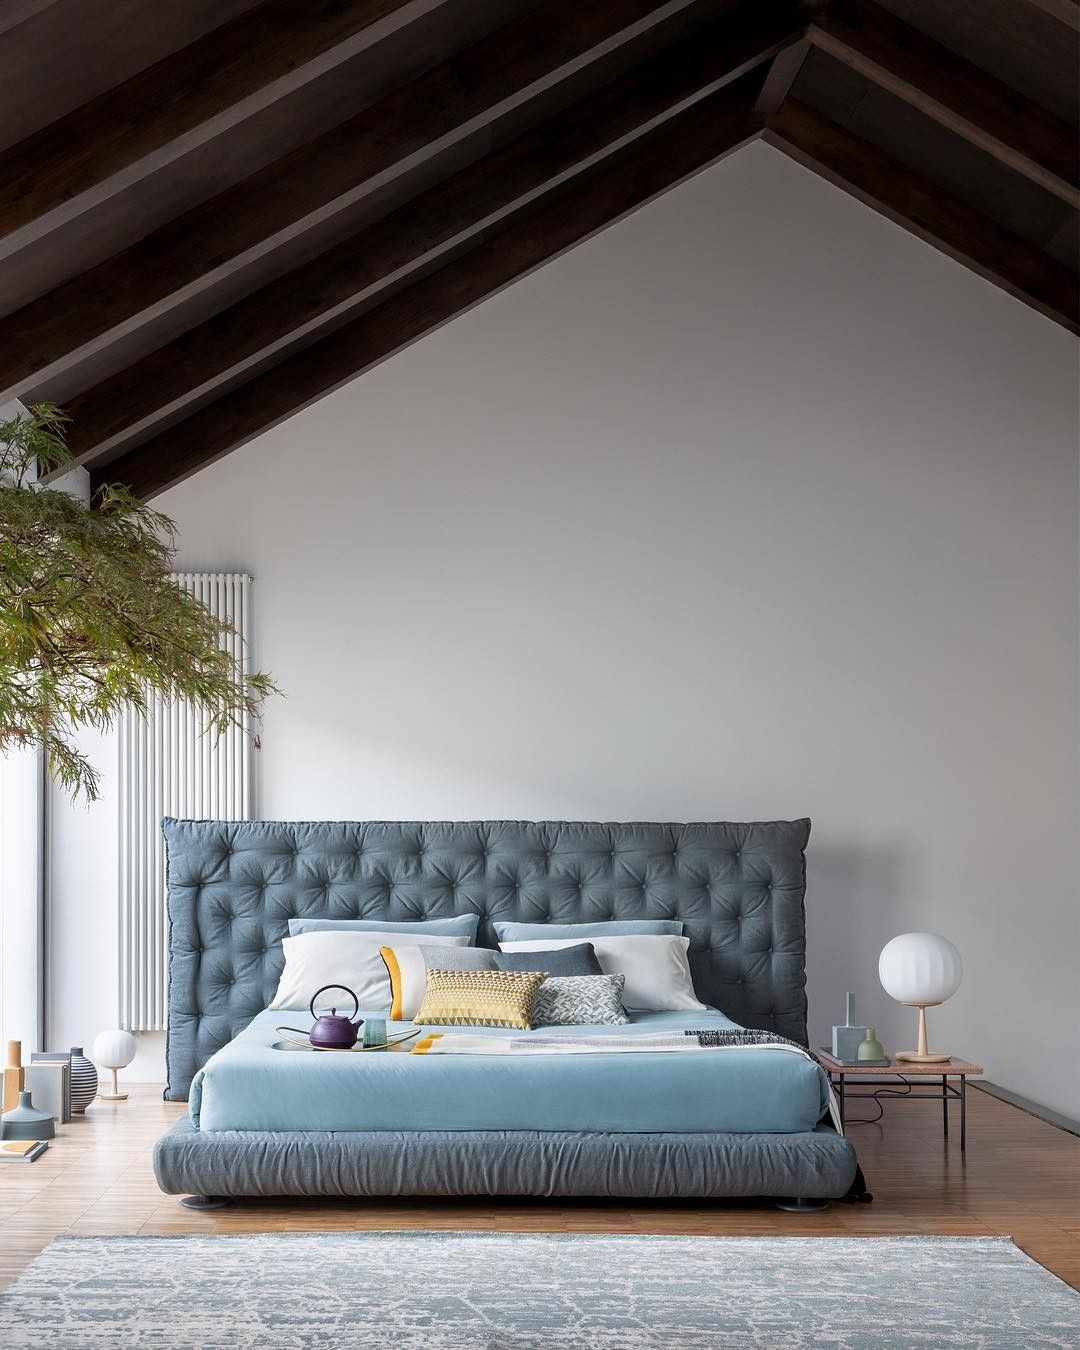 Bonaldo Schlafzimmer bequem Designer bett, Bett, Haus deko